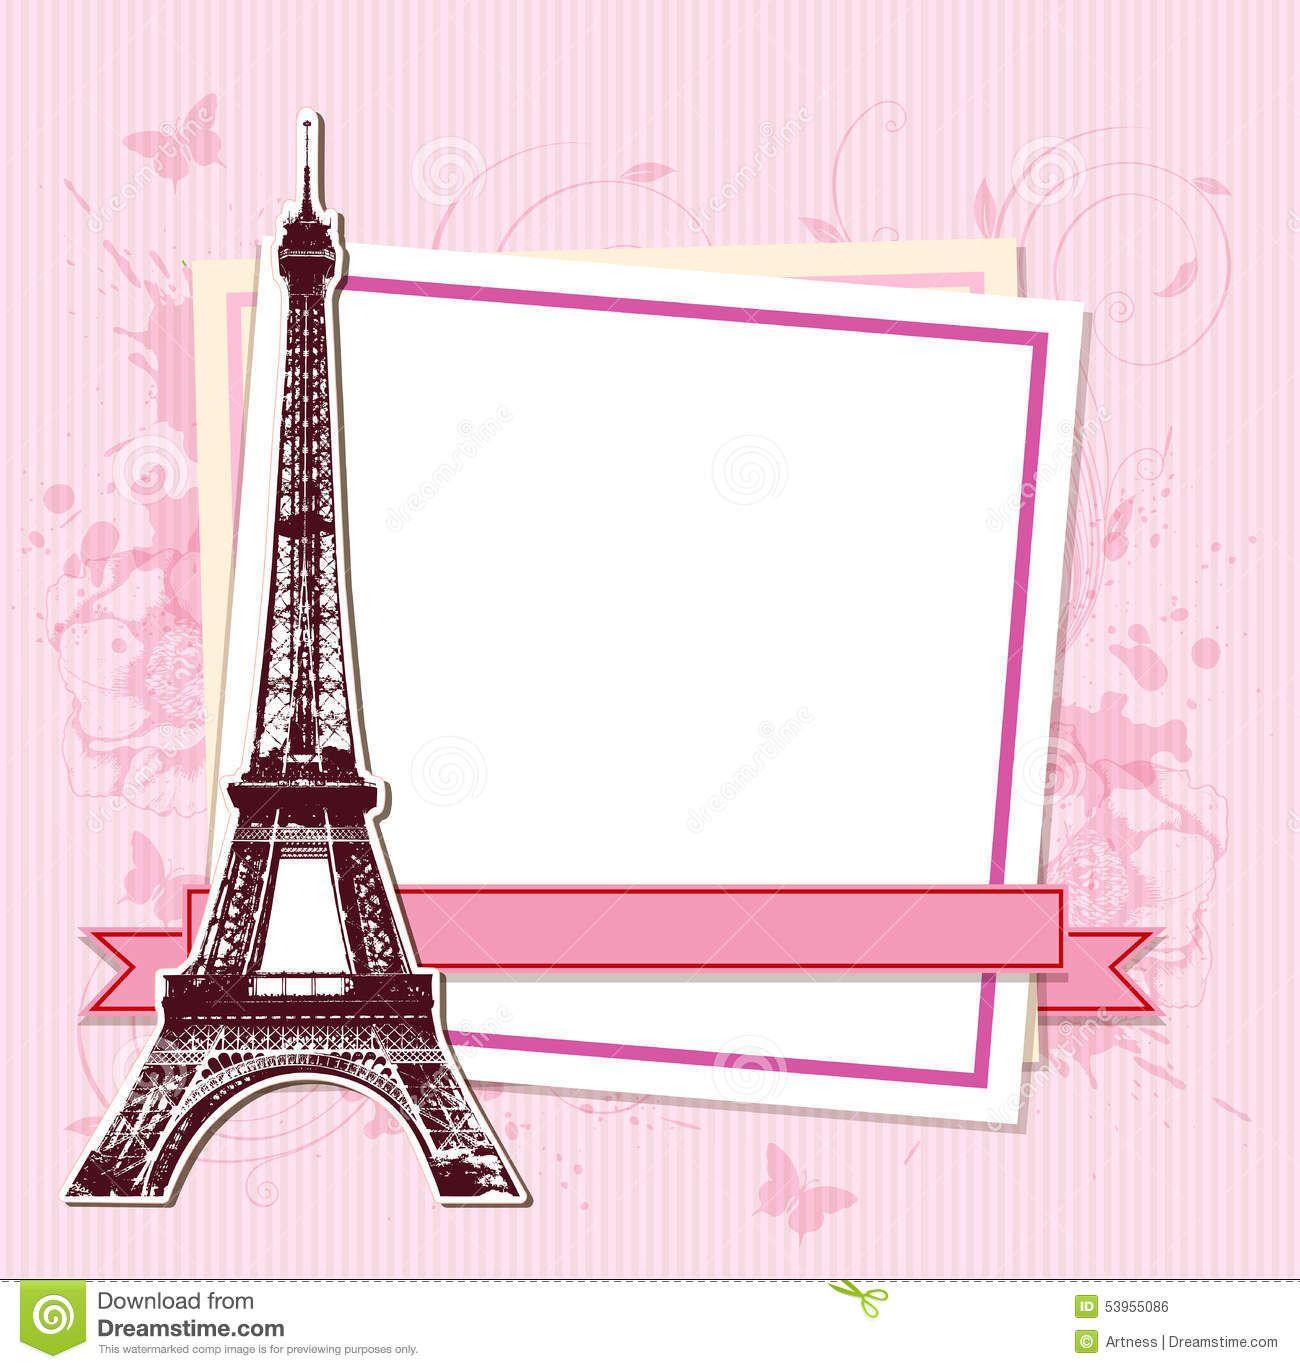 White frame paris eiffel tower pink background 53955086g 1300 white frame with paris and the eiffel tower vector by artspace on vectorstock jeuxipadfo Images